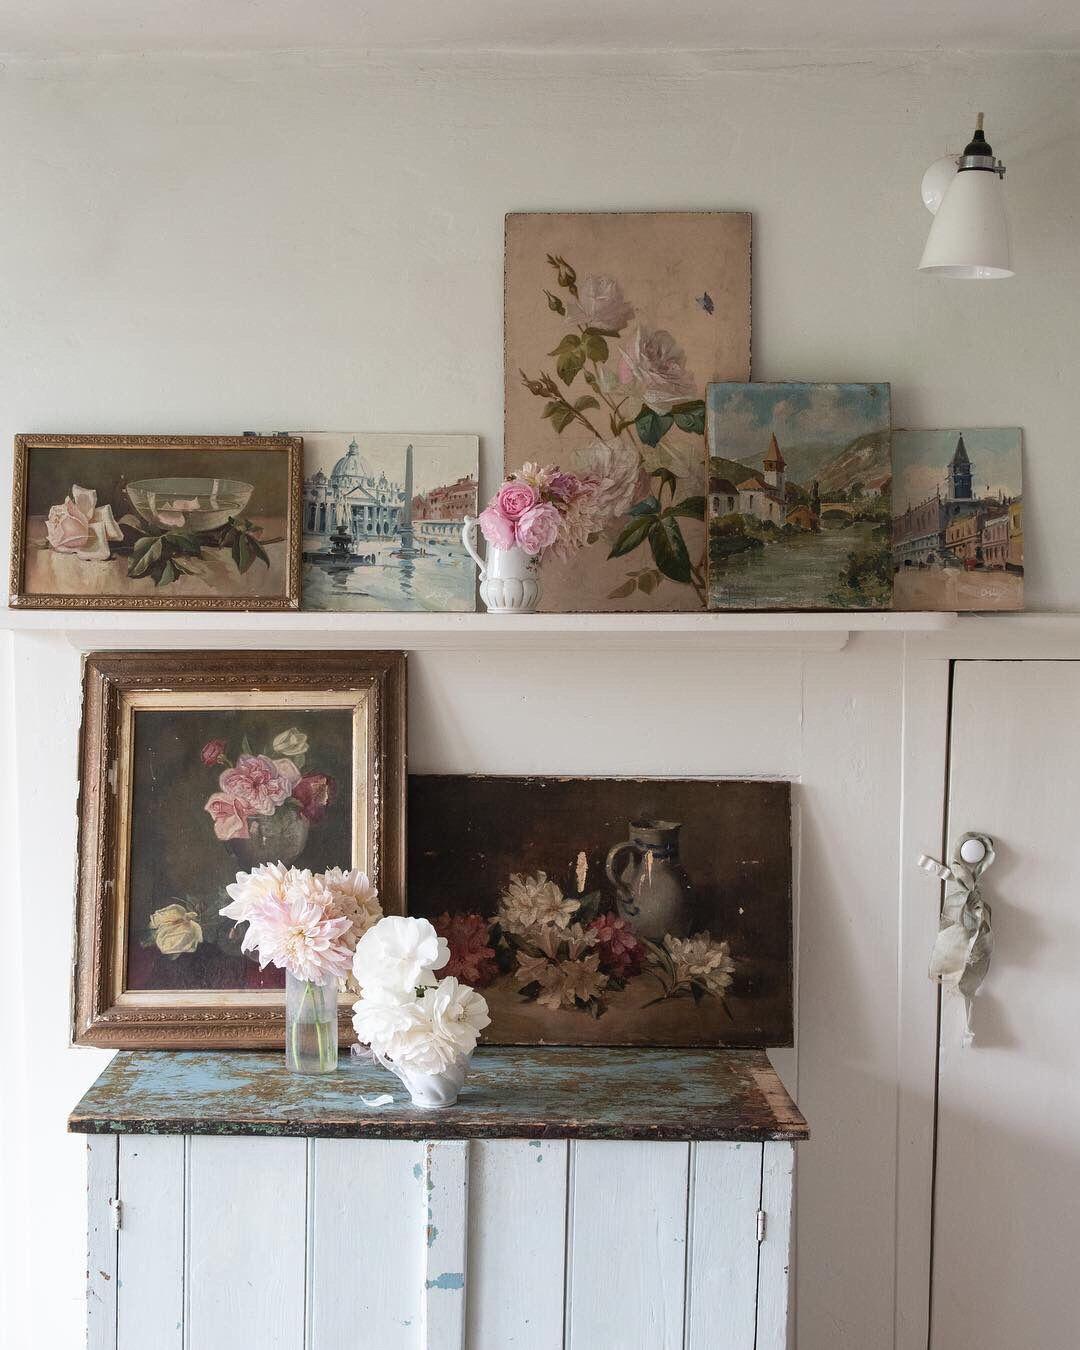 Pin By Carol Jones On HOME INSPIRATION # 2